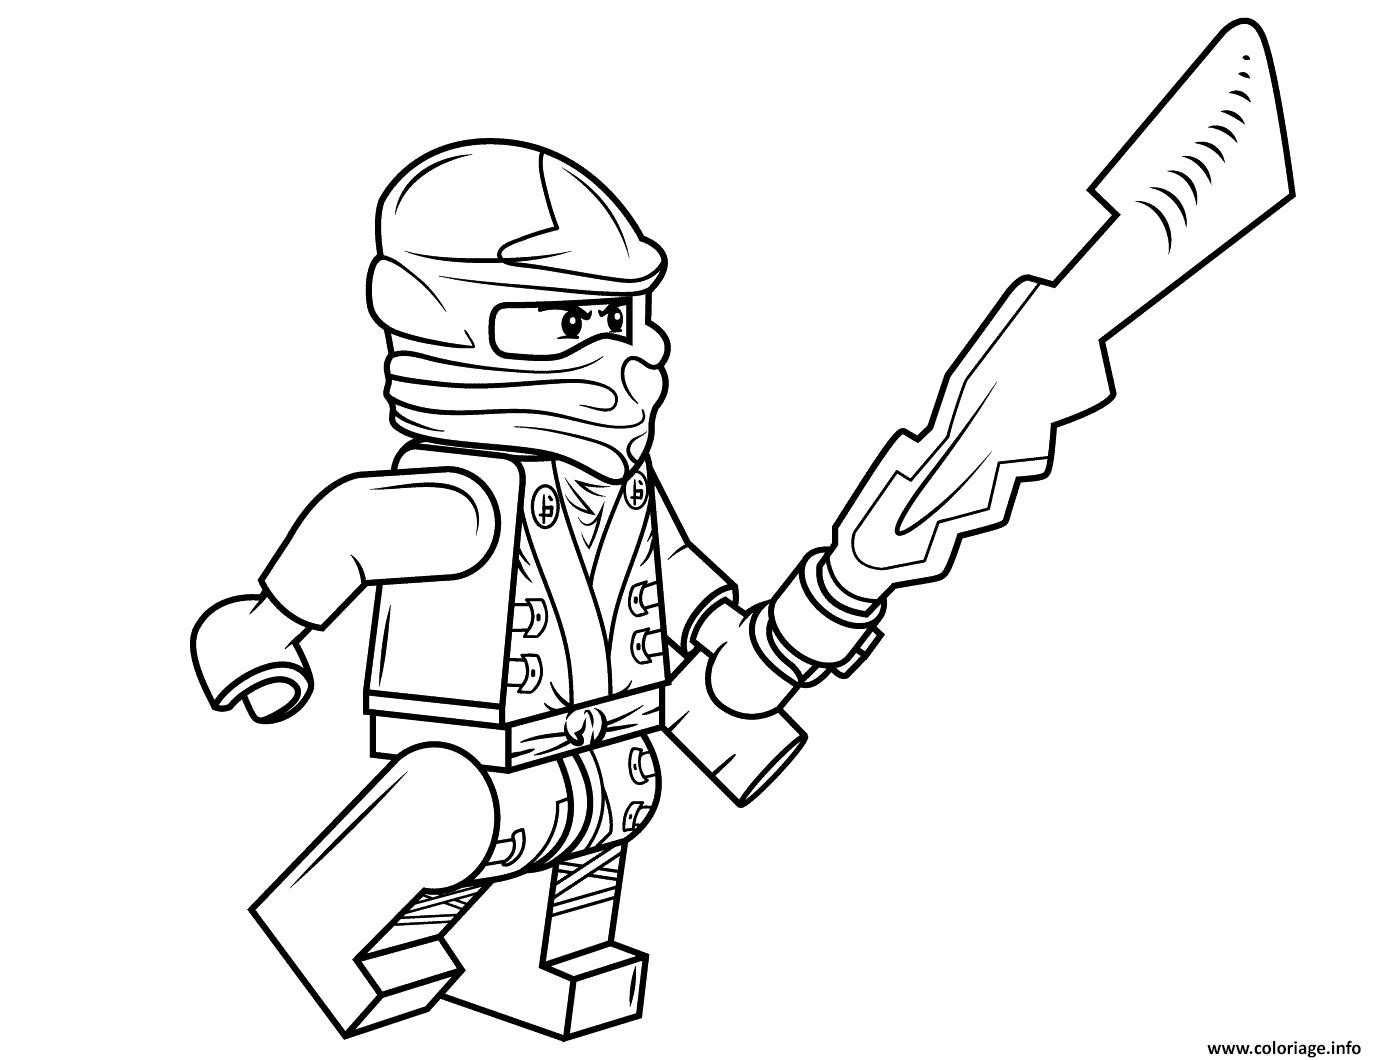 Lego Ninjago Drawing At Getdrawingscom Free For Personal Use Lego